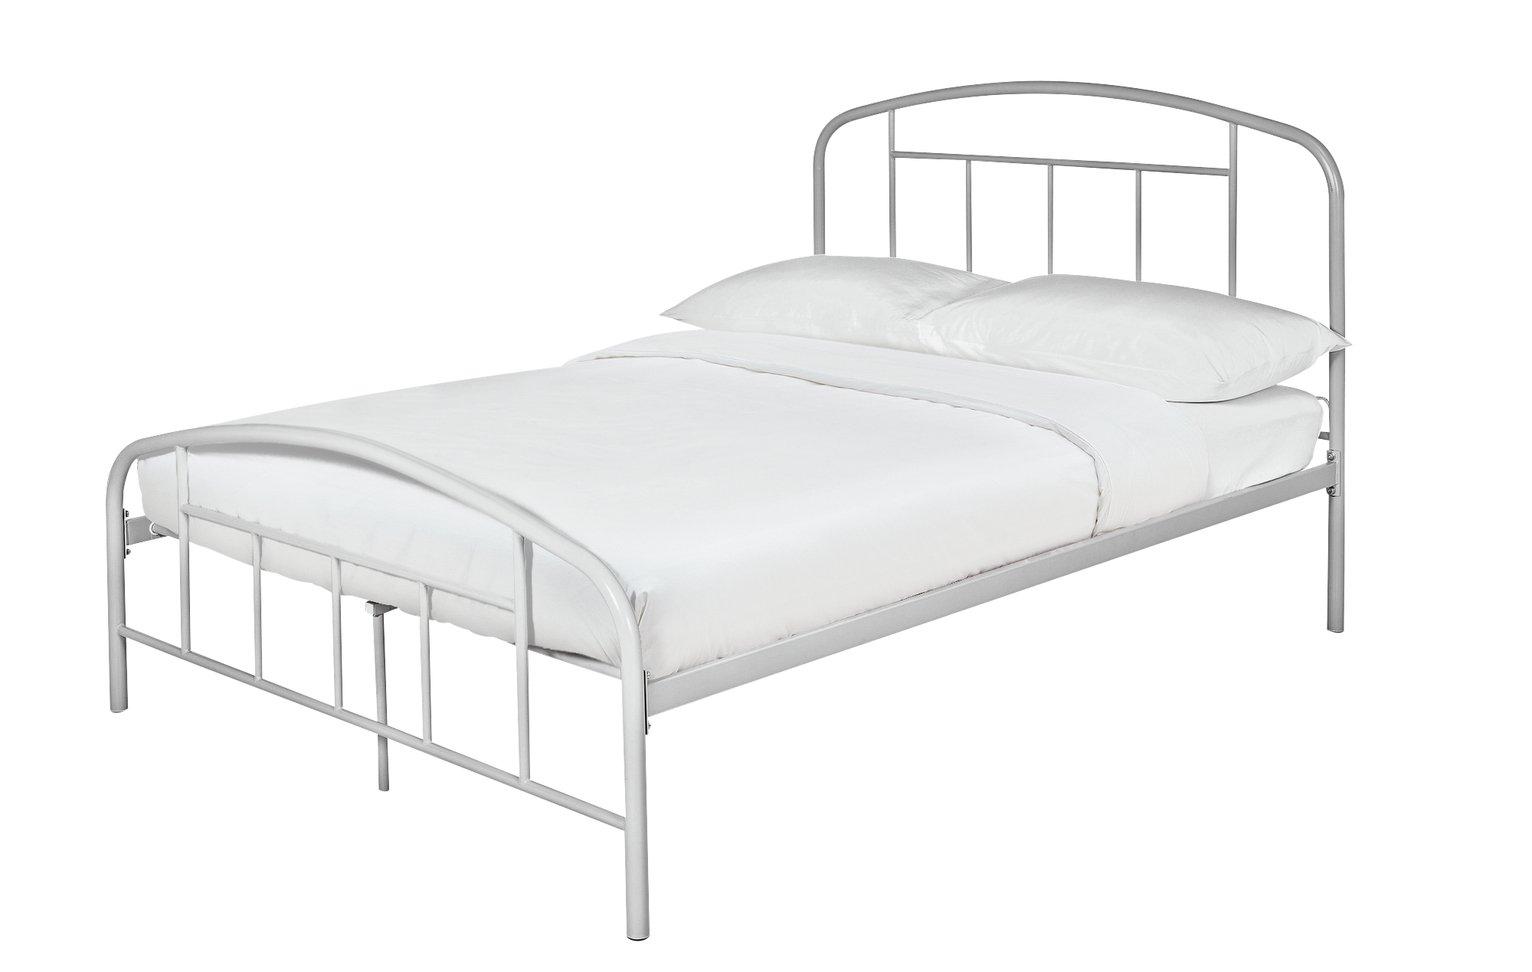 Argos Home Pippa Double Bed Frame - Grey